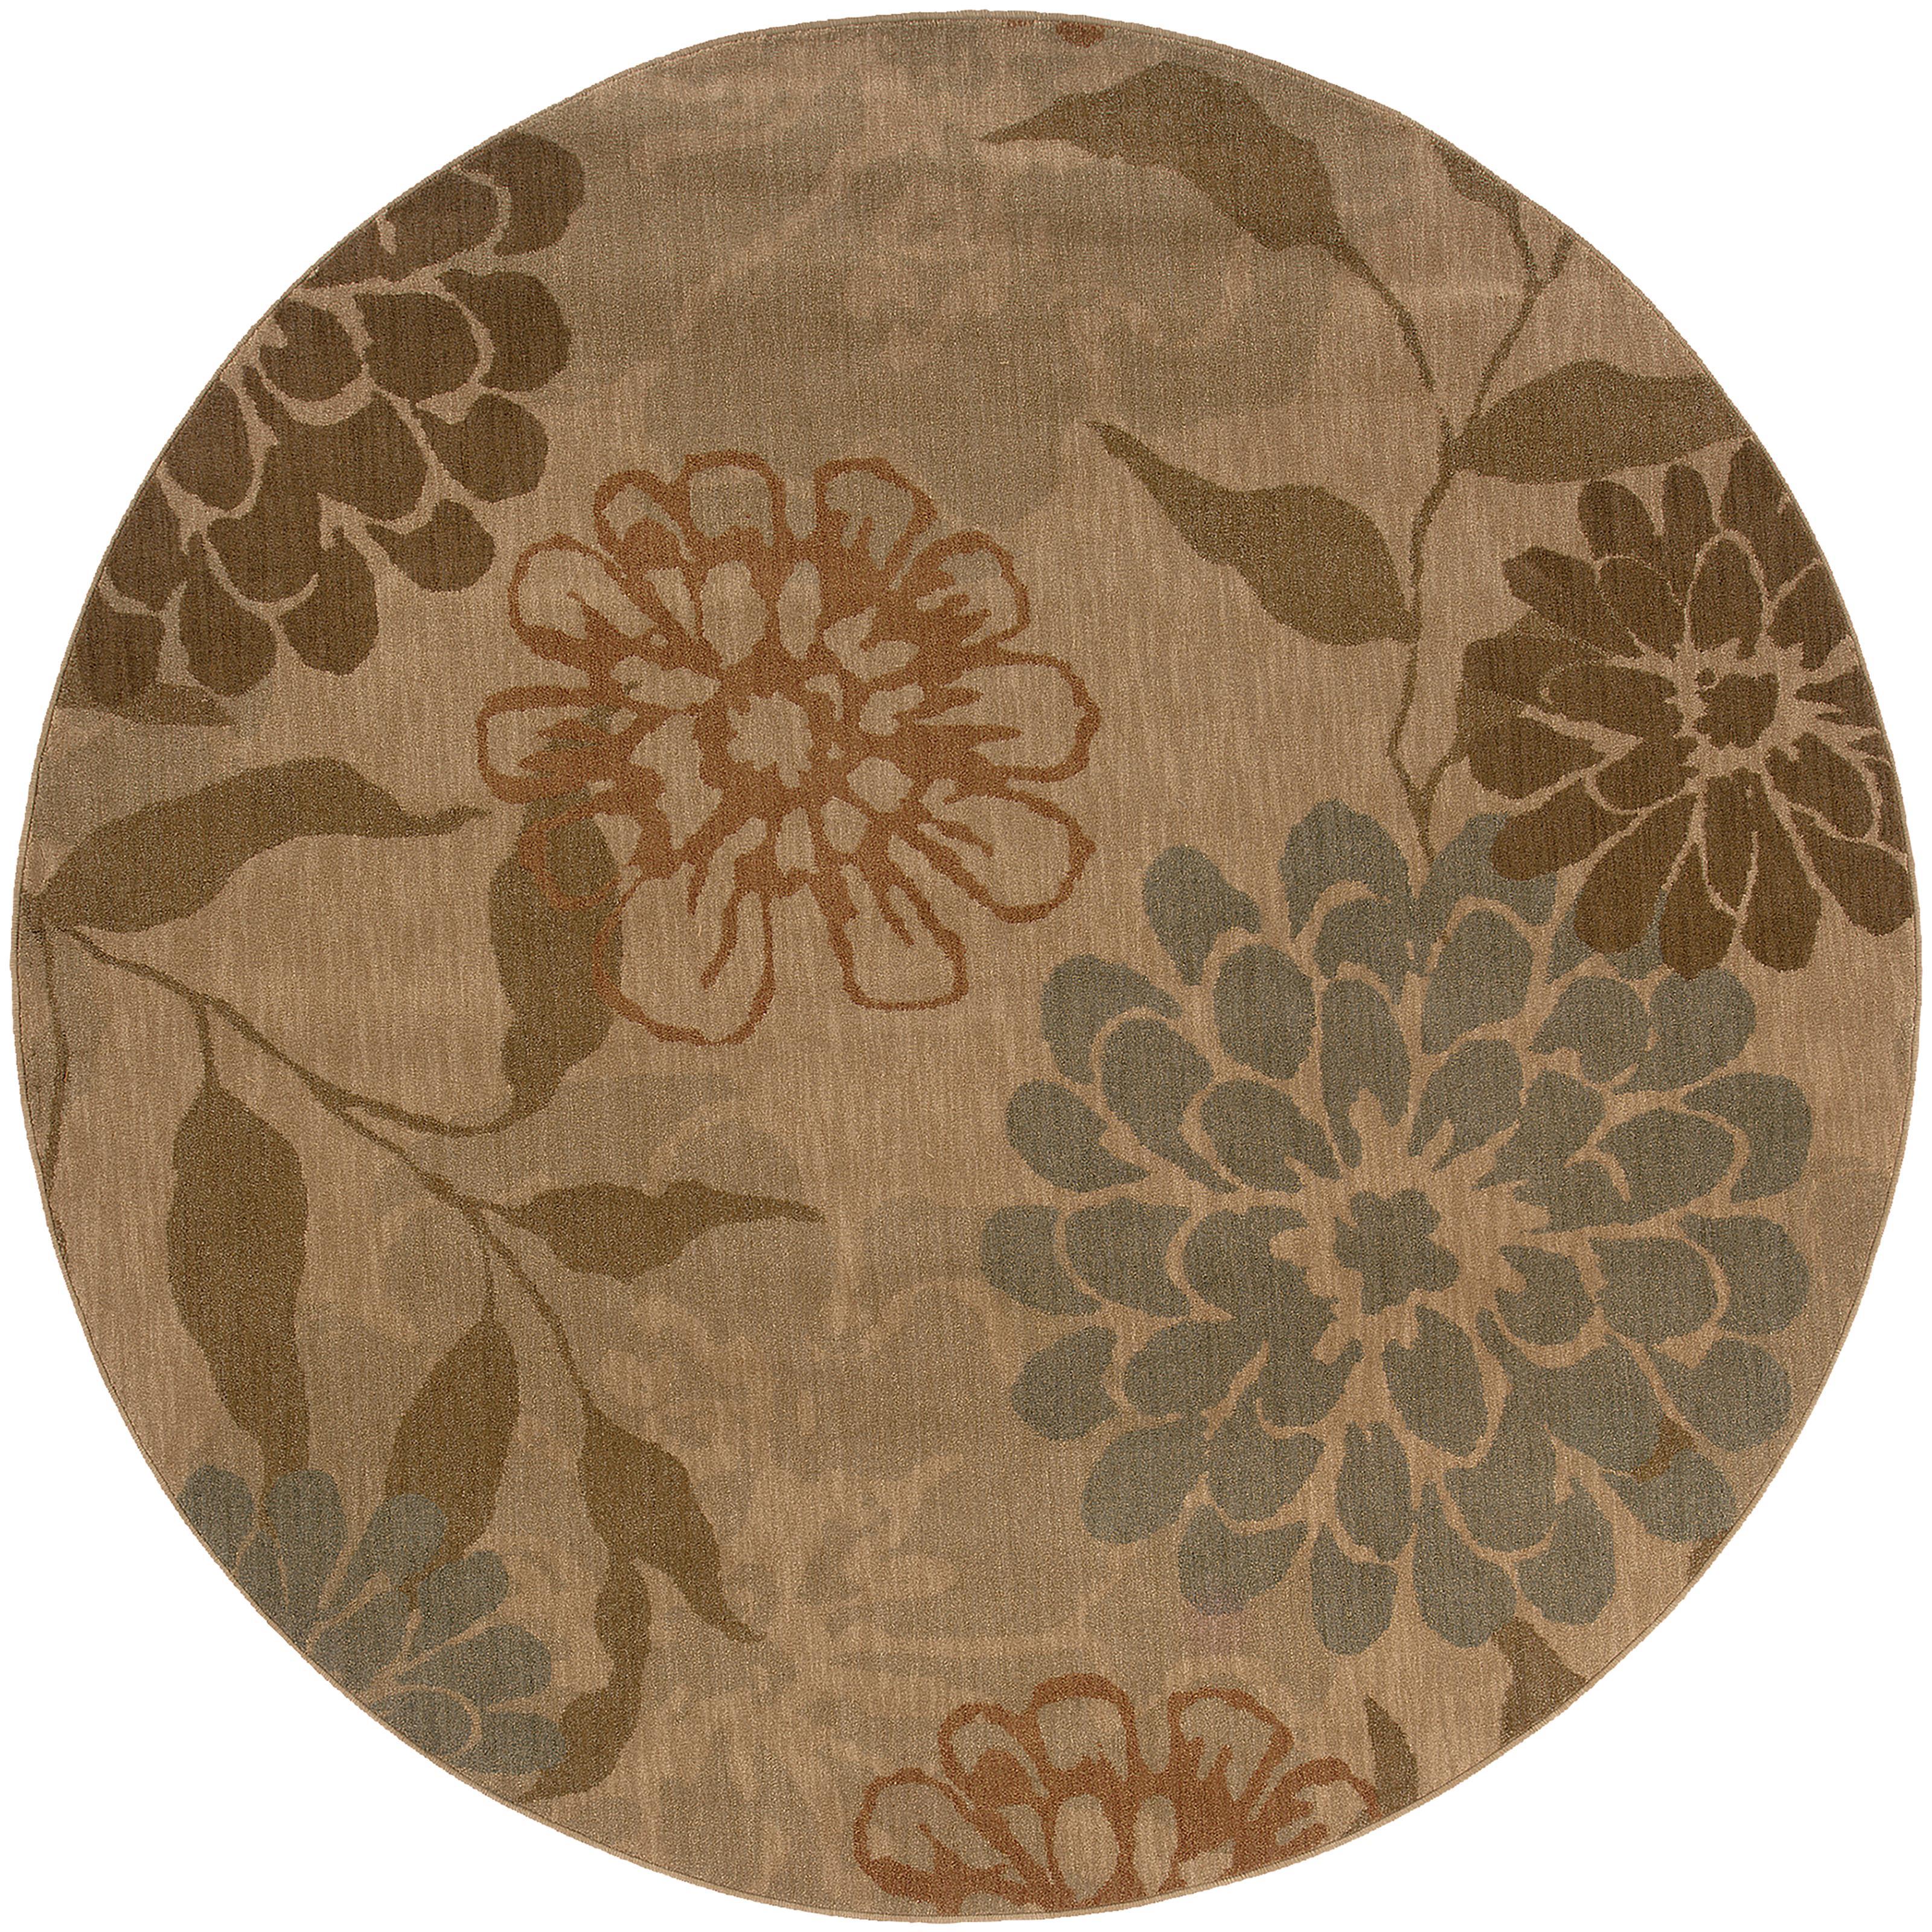 "Oriental Weavers Infinity 7' 8"" Rug - Item Number: I1134A235RDST"